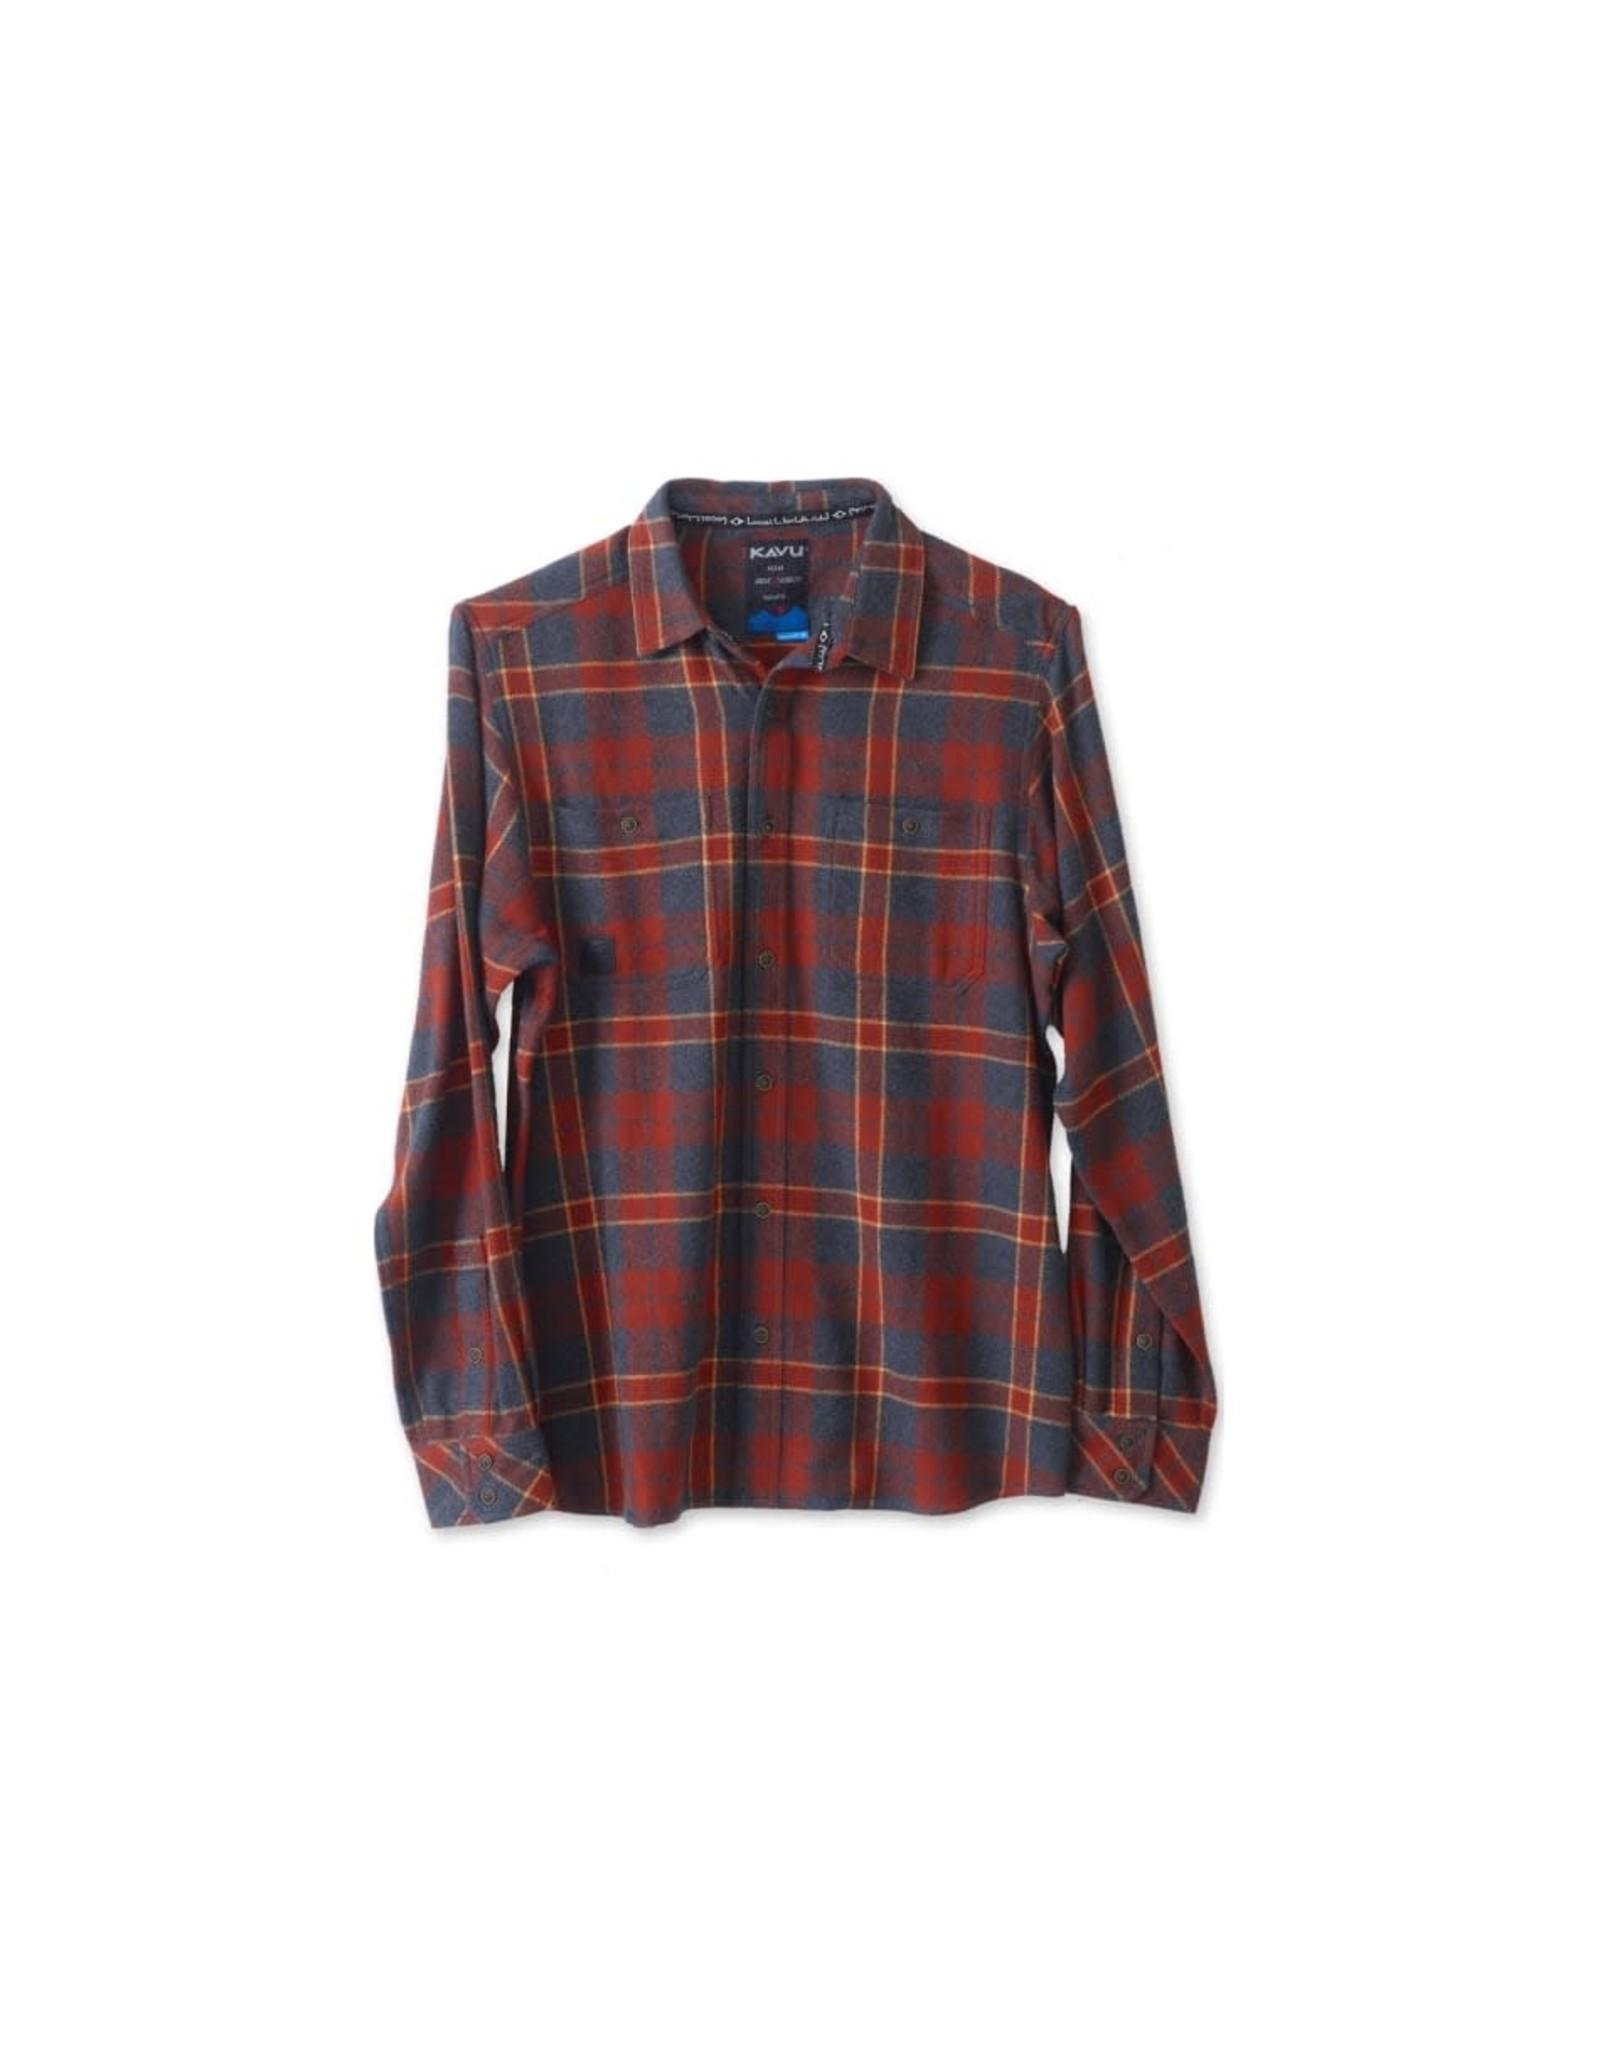 KAVU M's Big Joe Red Oak Shirt